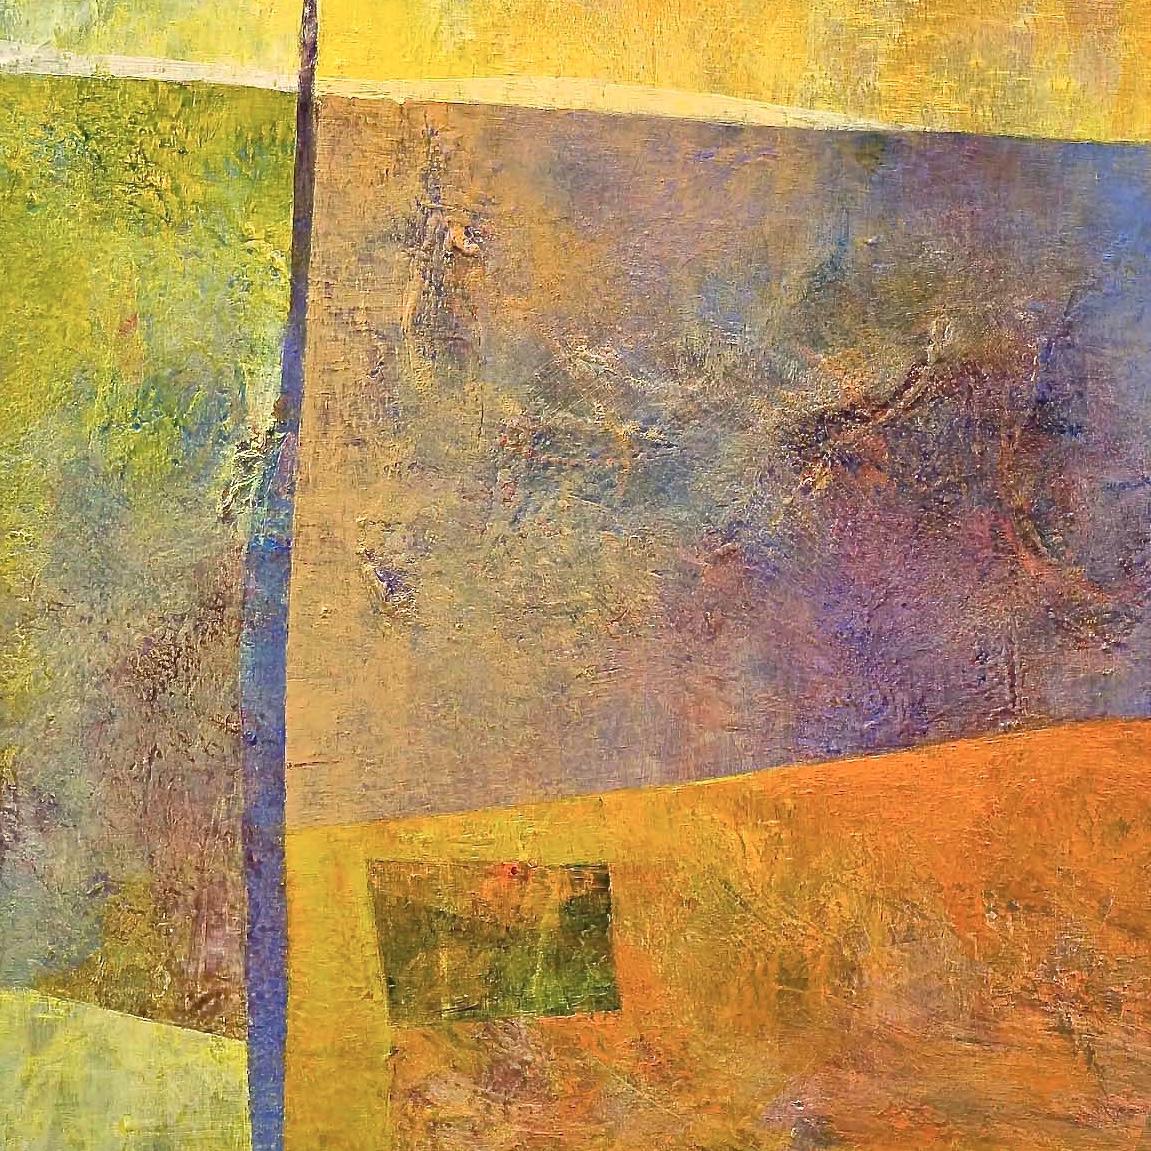 """Lemon Fog"" | Artist Mastery Guide, Marianne Mitchell"